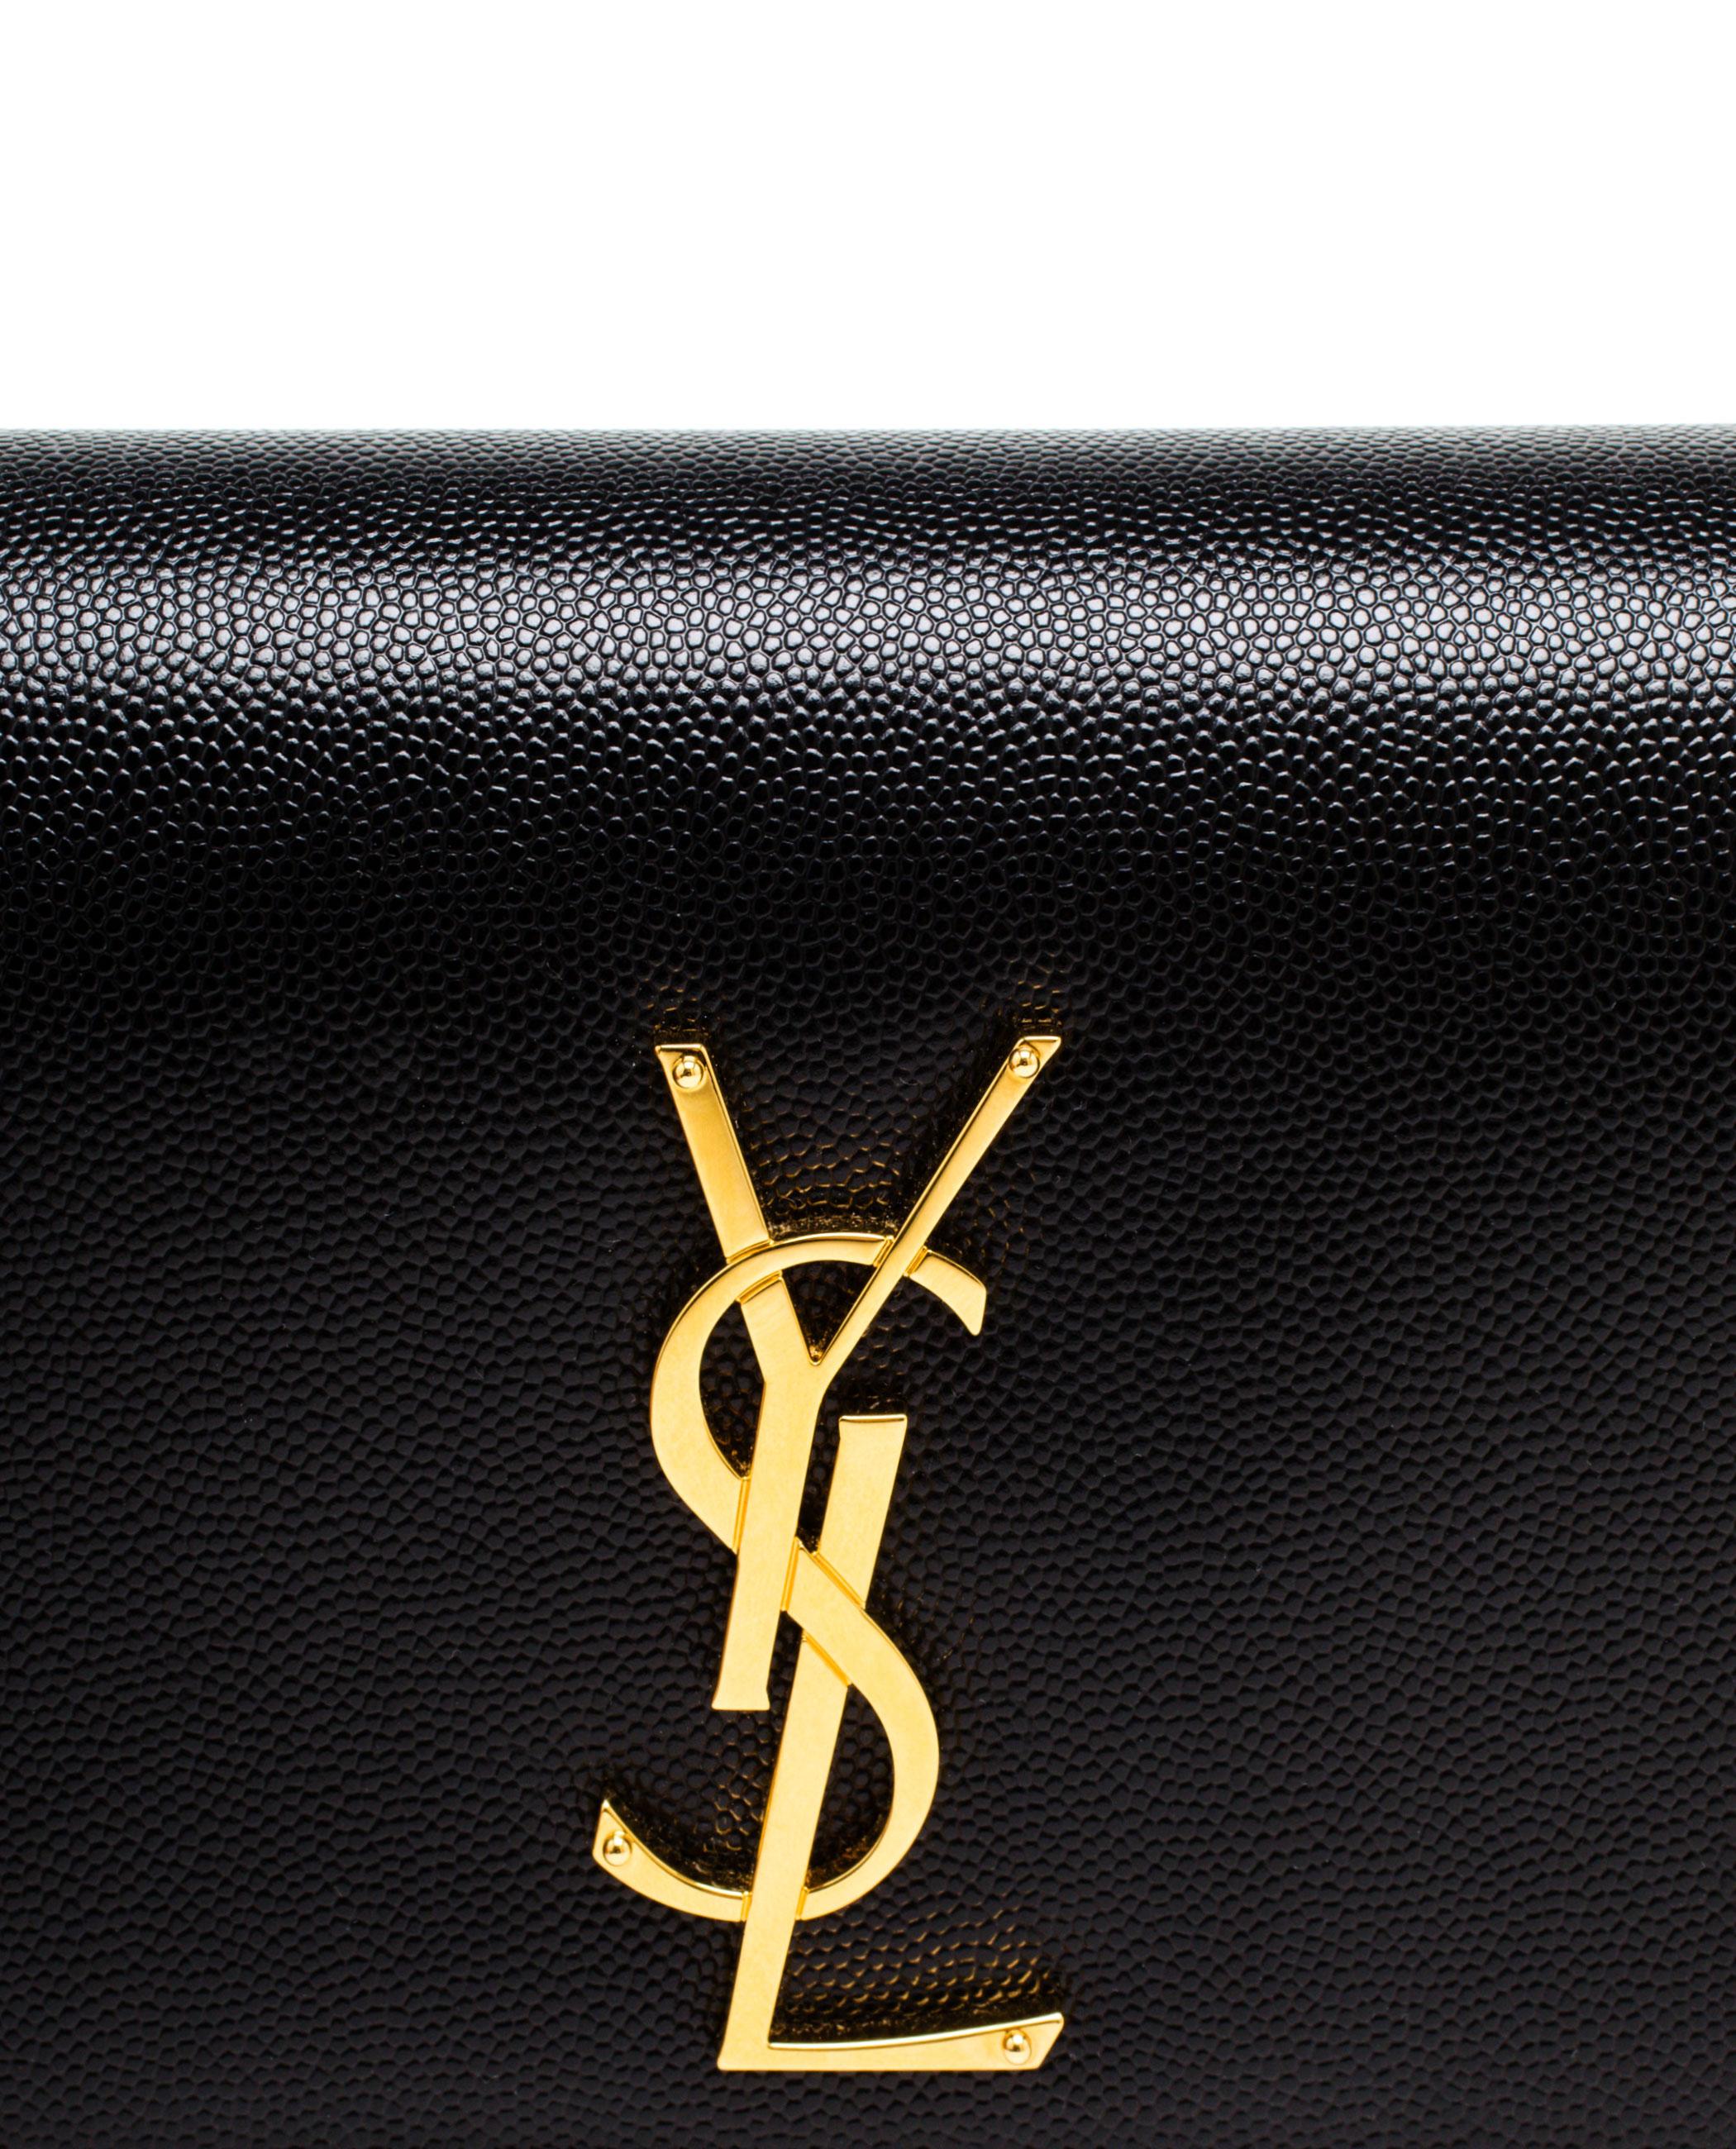 buy ysl mens wallet - monogram grained serpent clutch bag, gold